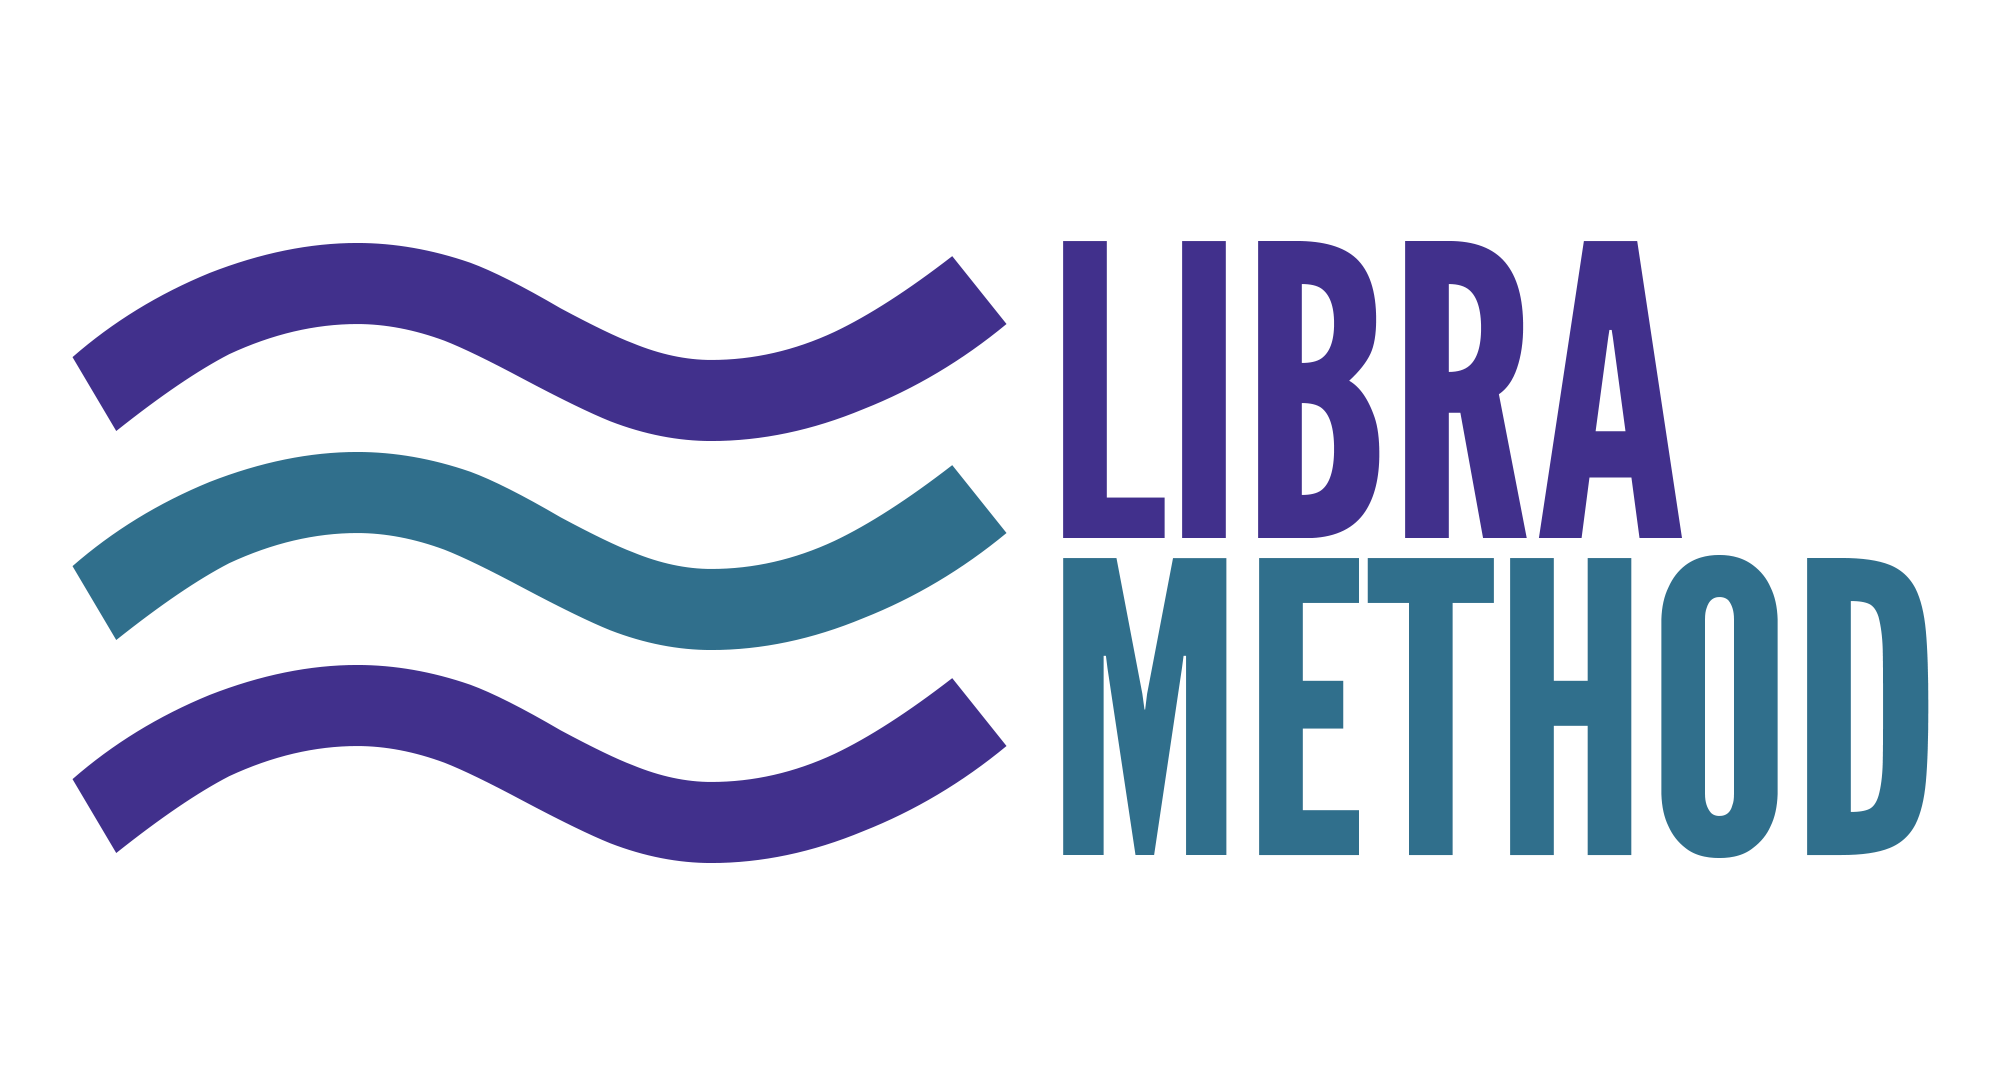 Libra Method